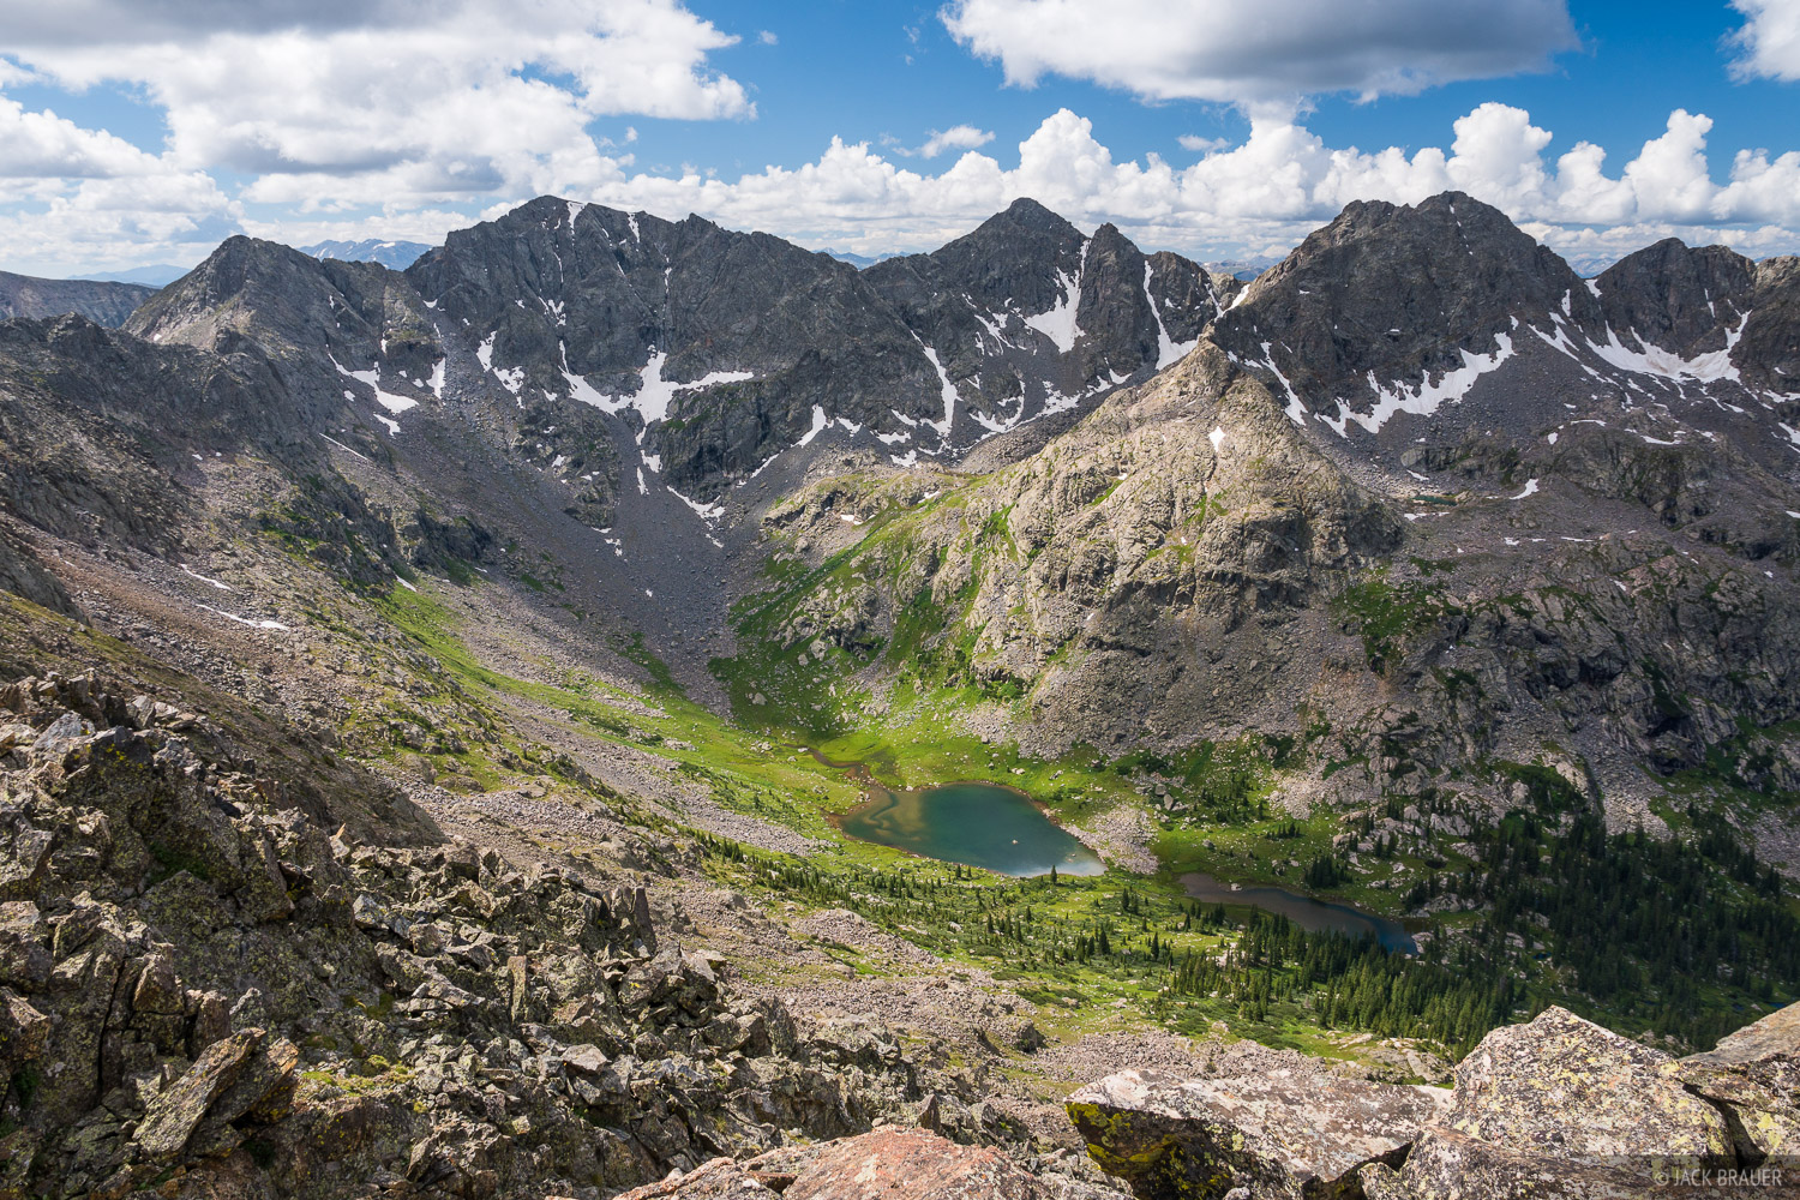 Looking down towards a remote alpine lake below rugged peaks deep in the Holy Cross Wilderness.